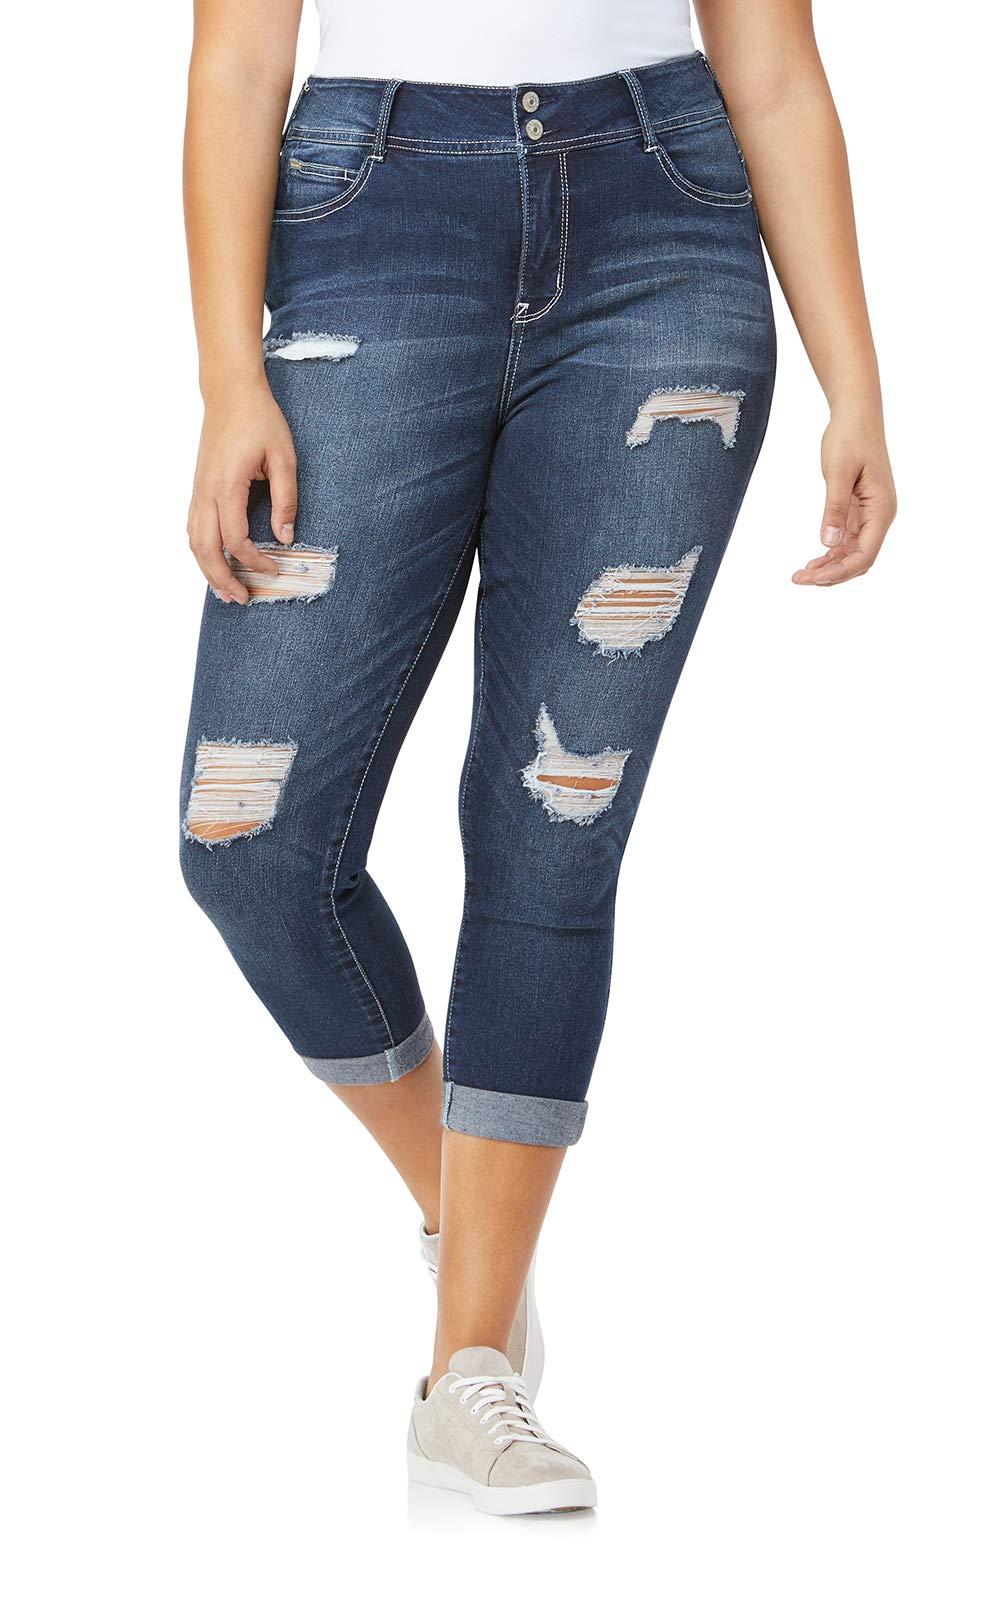 WallFlower Women's Plus-Size Luscious Curvy Destructed Ankle Skinny Jeans in Shawna, 14 Plus